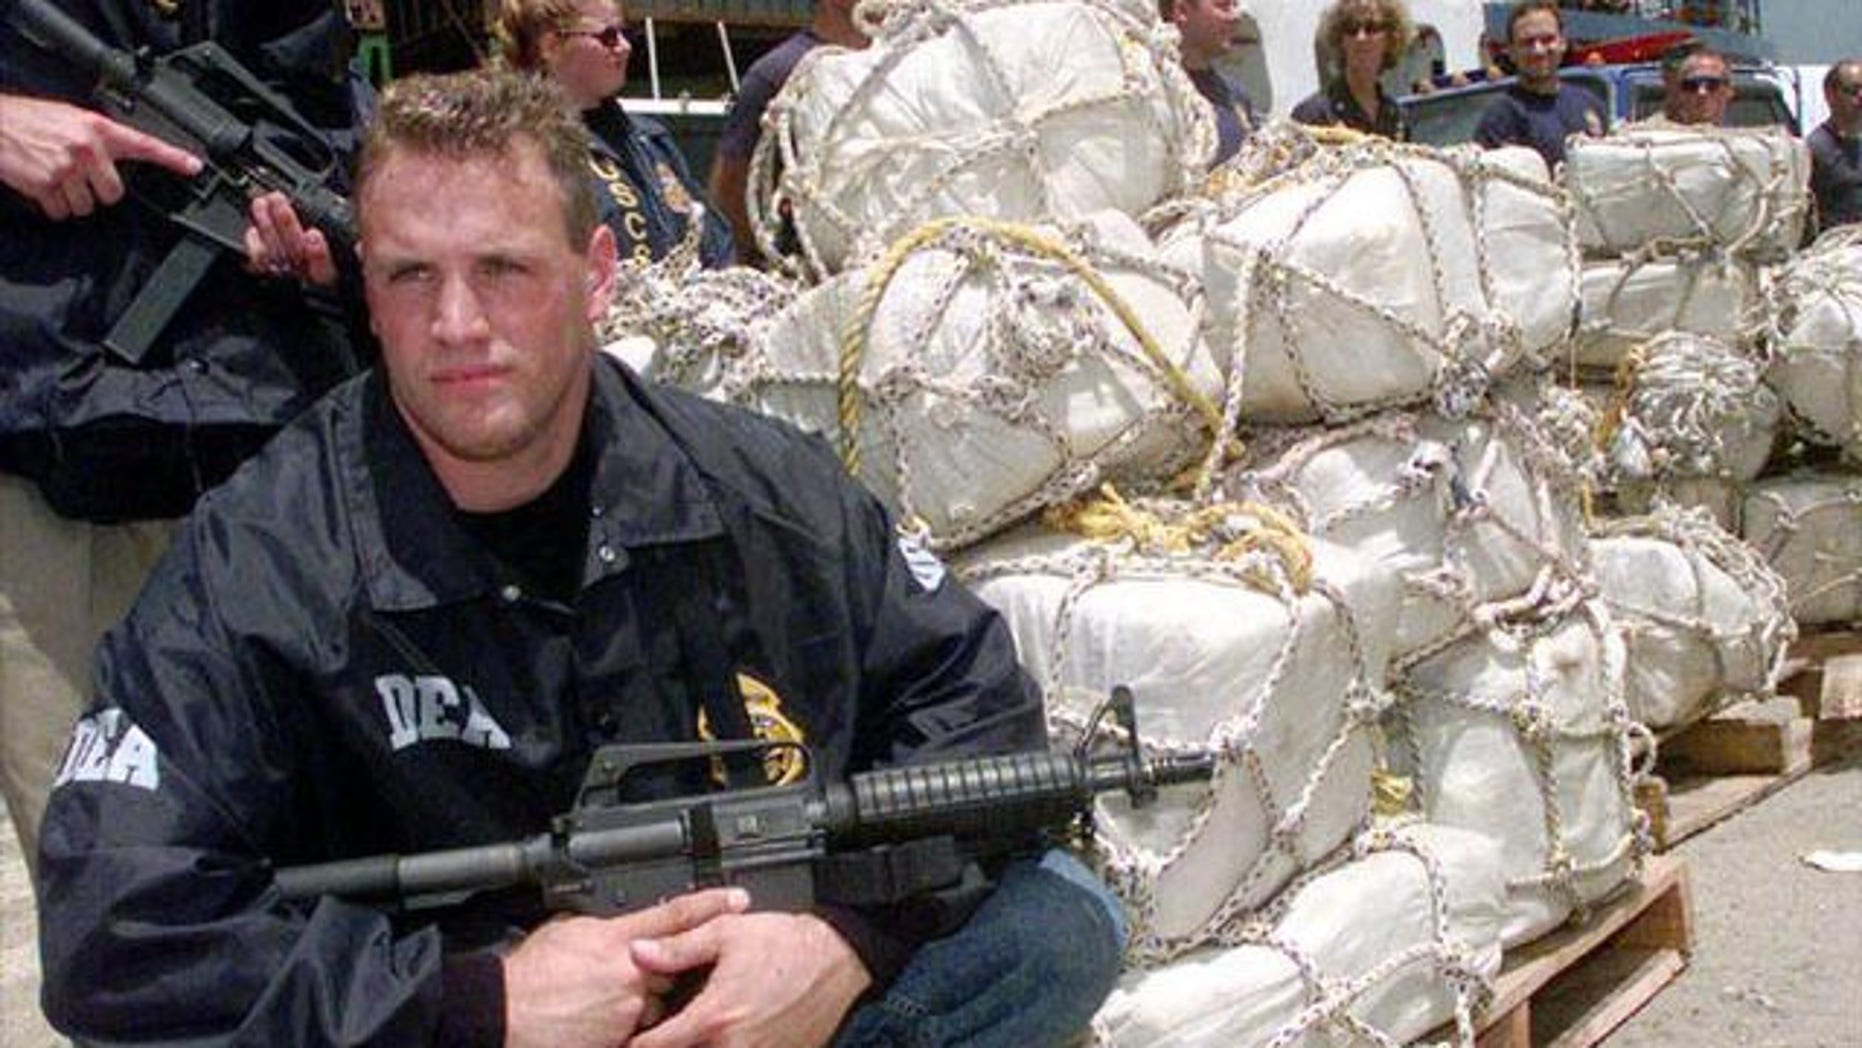 A DEA agent guards a pile of confiscated cocaine (AP Photo)